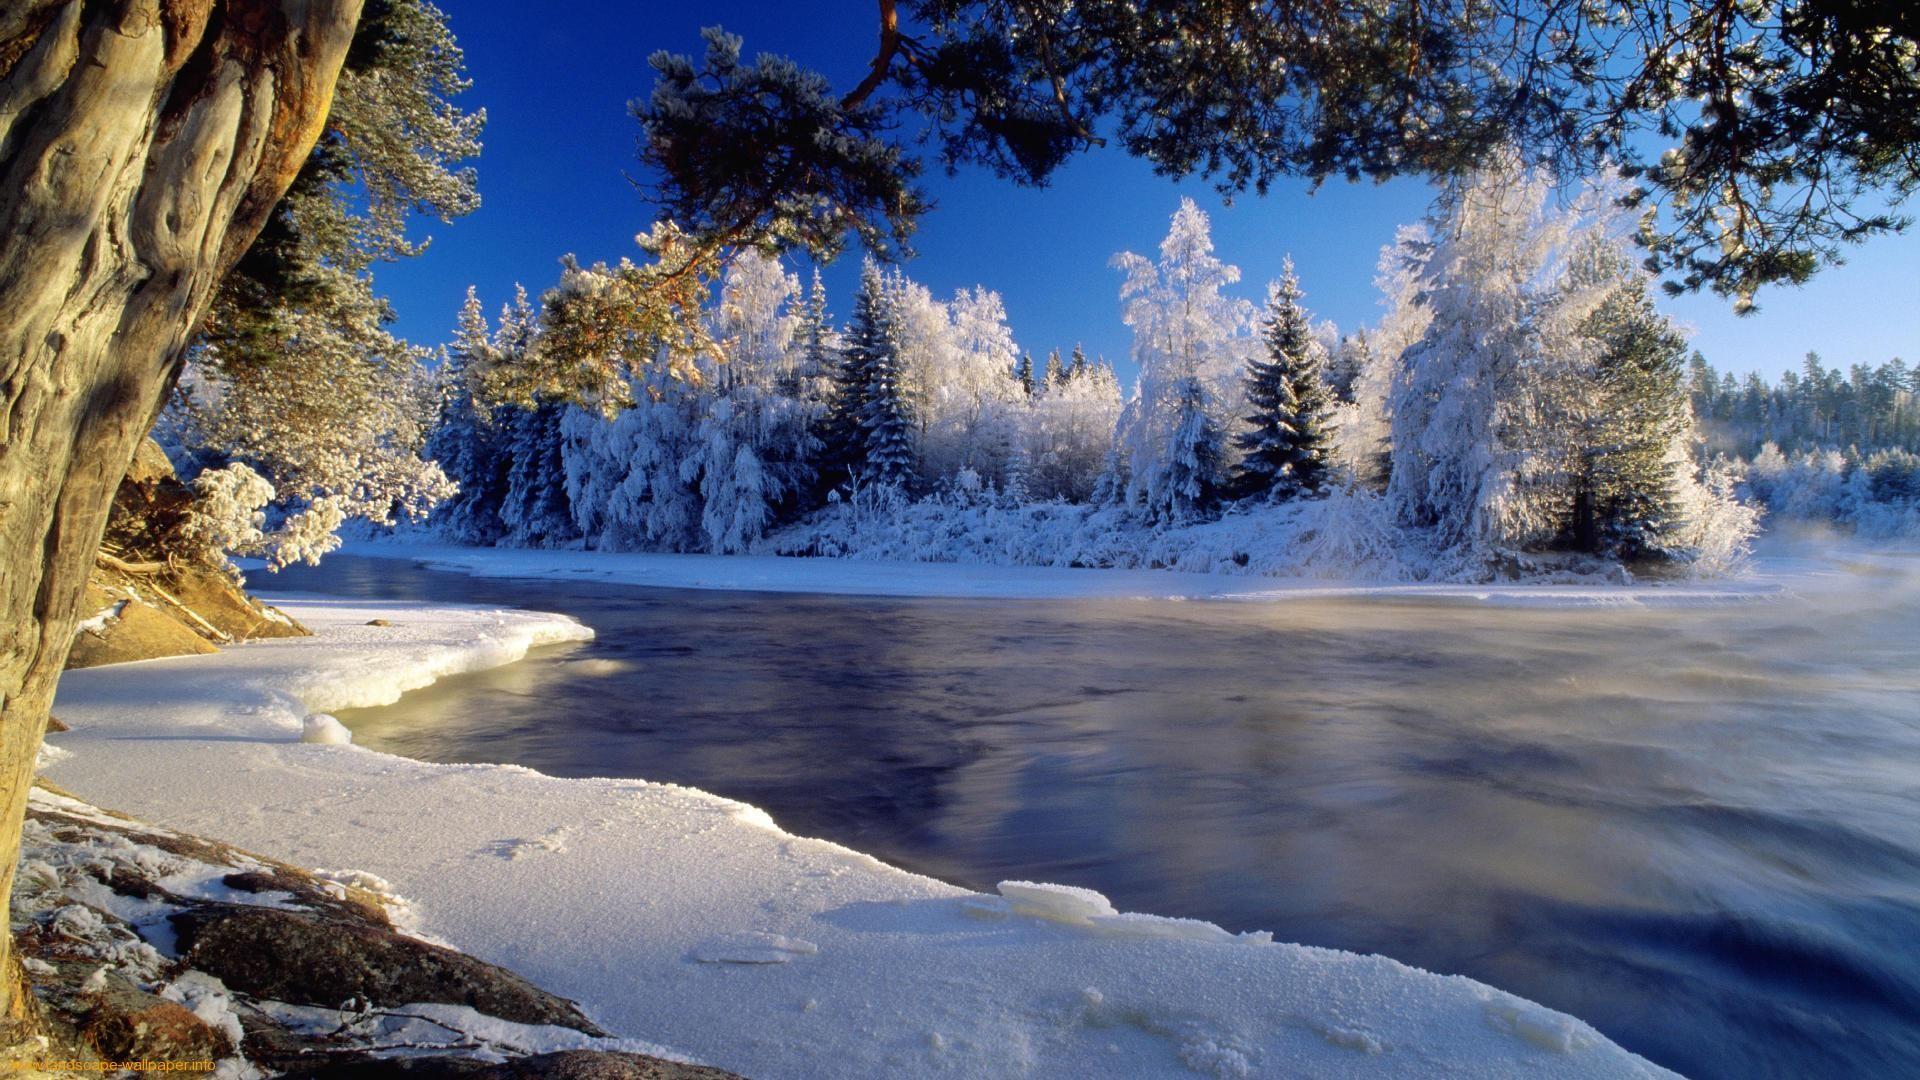 Winter Wallpapers For Desktop Backgrounds (76 Wallpapers) – HD Wallpapers